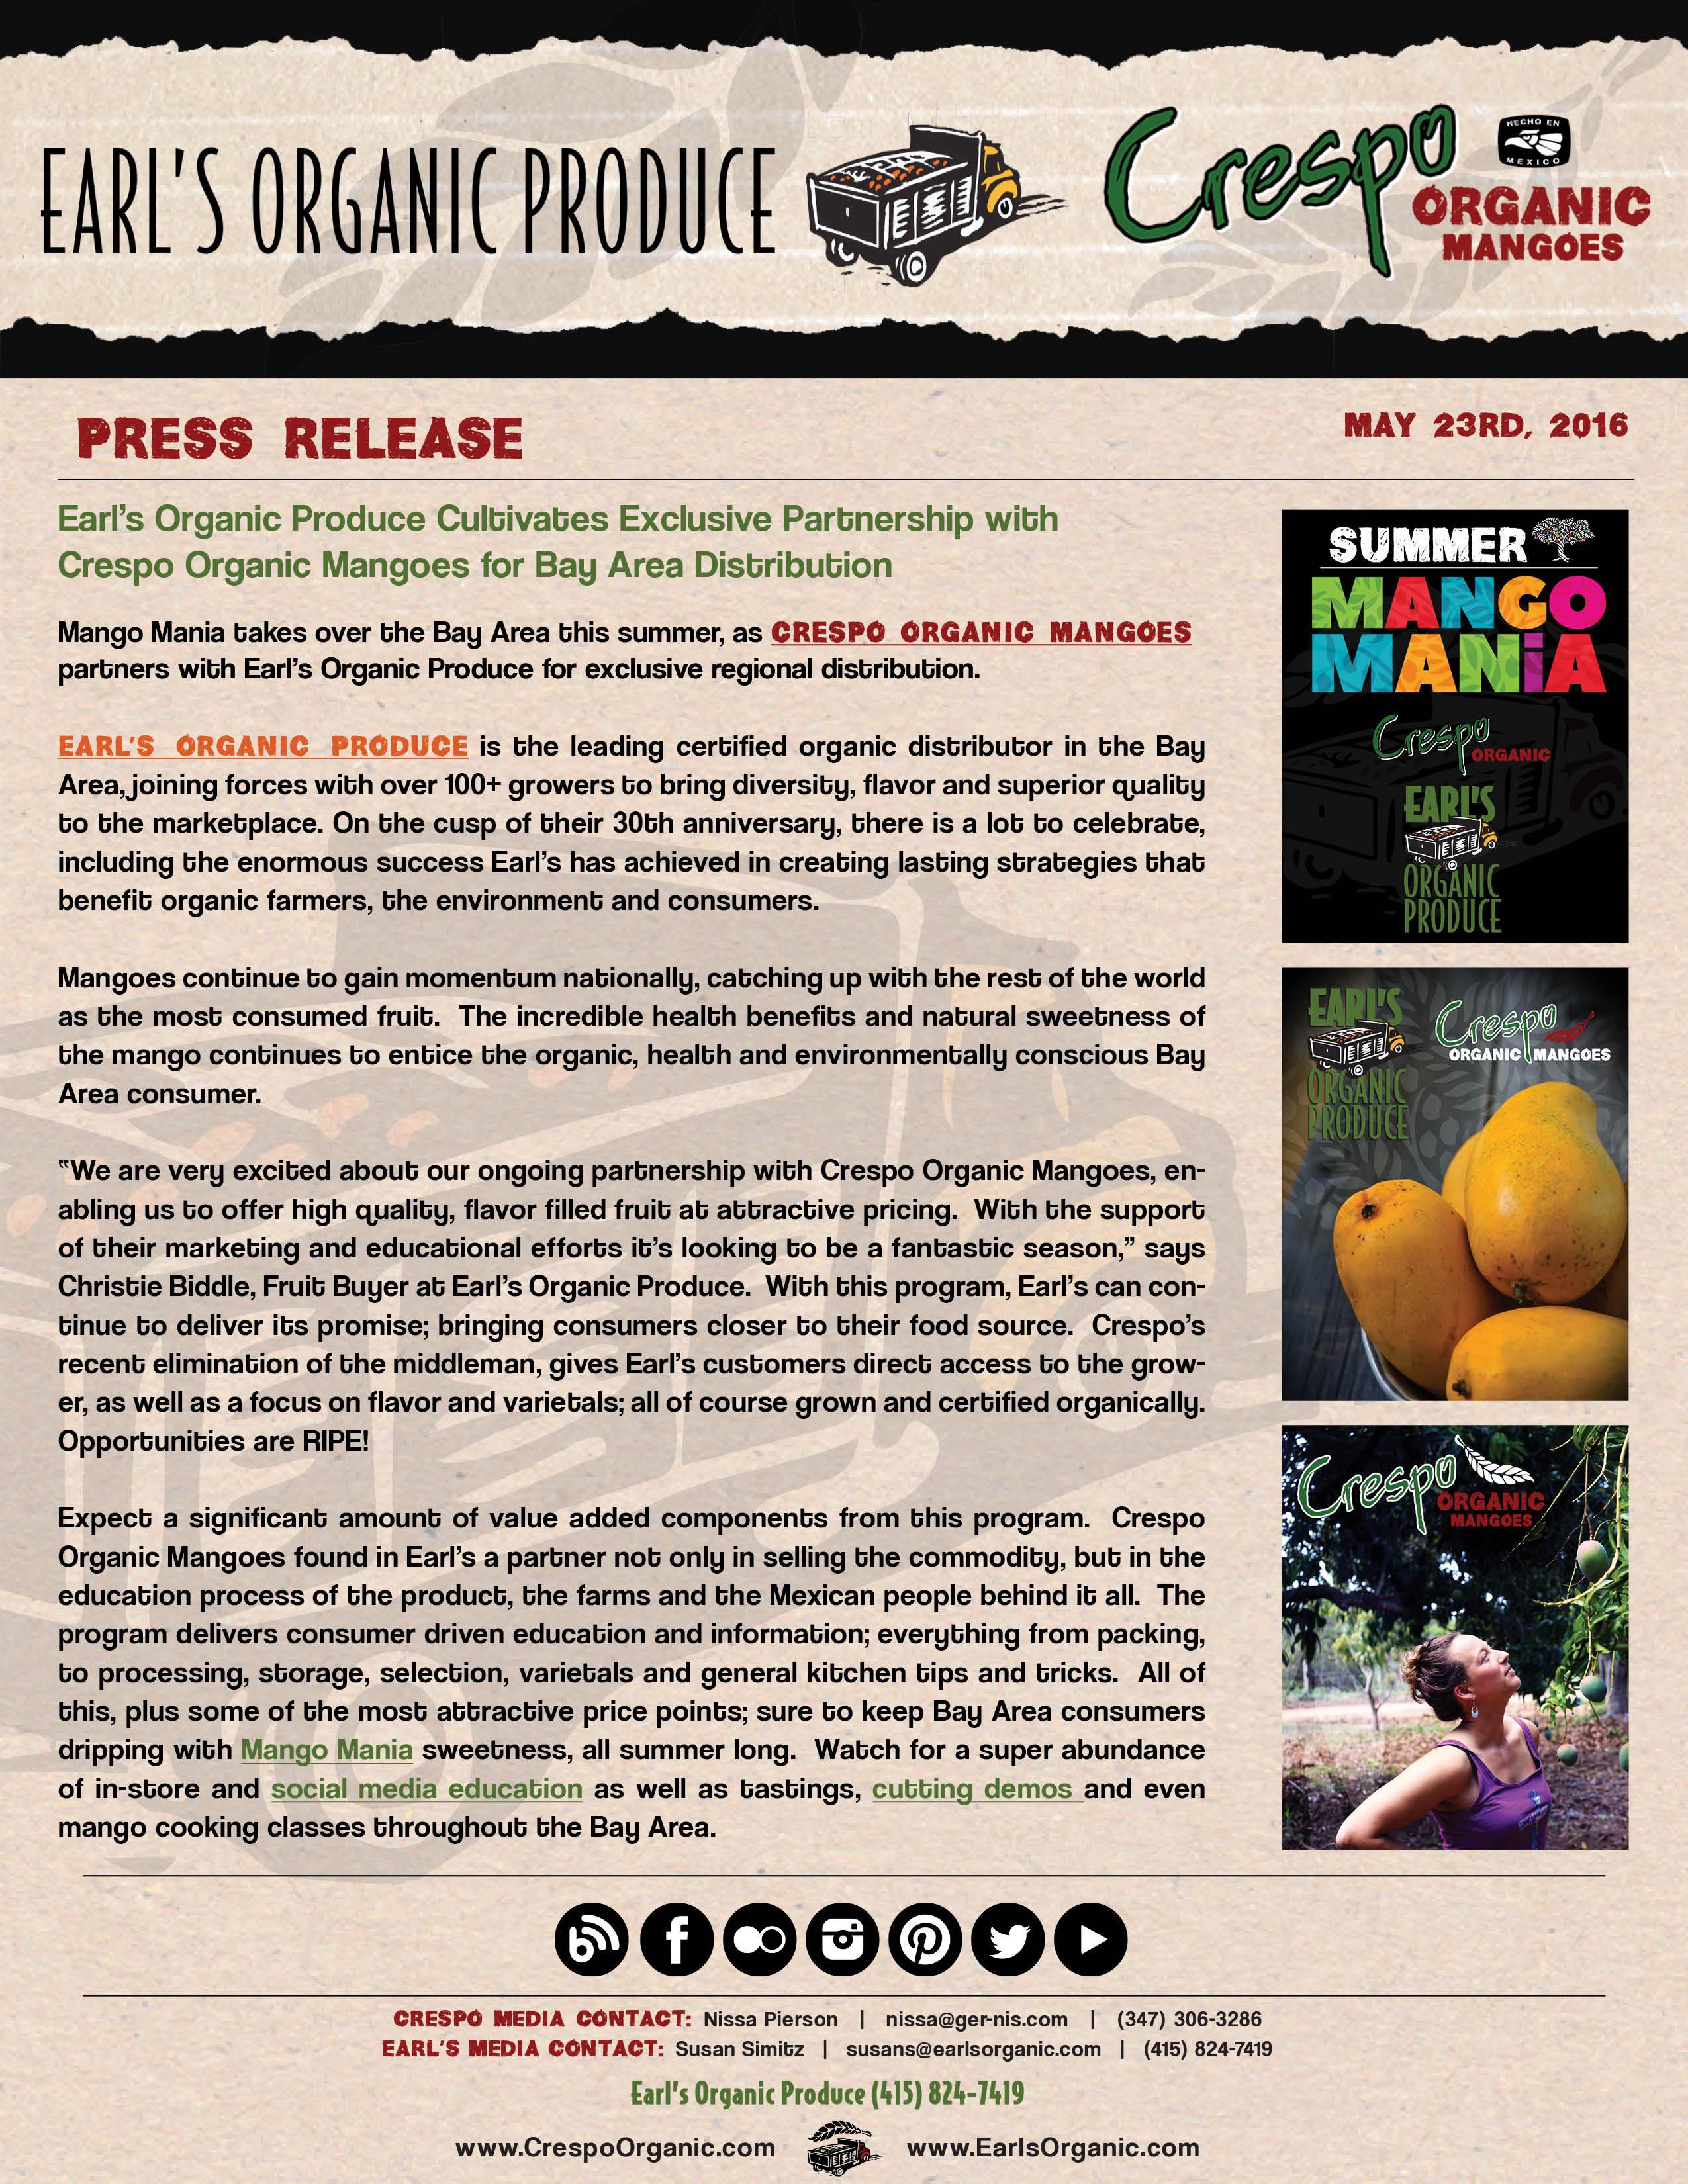 Earl's Organic Produce & Crespo Organic Mangoes